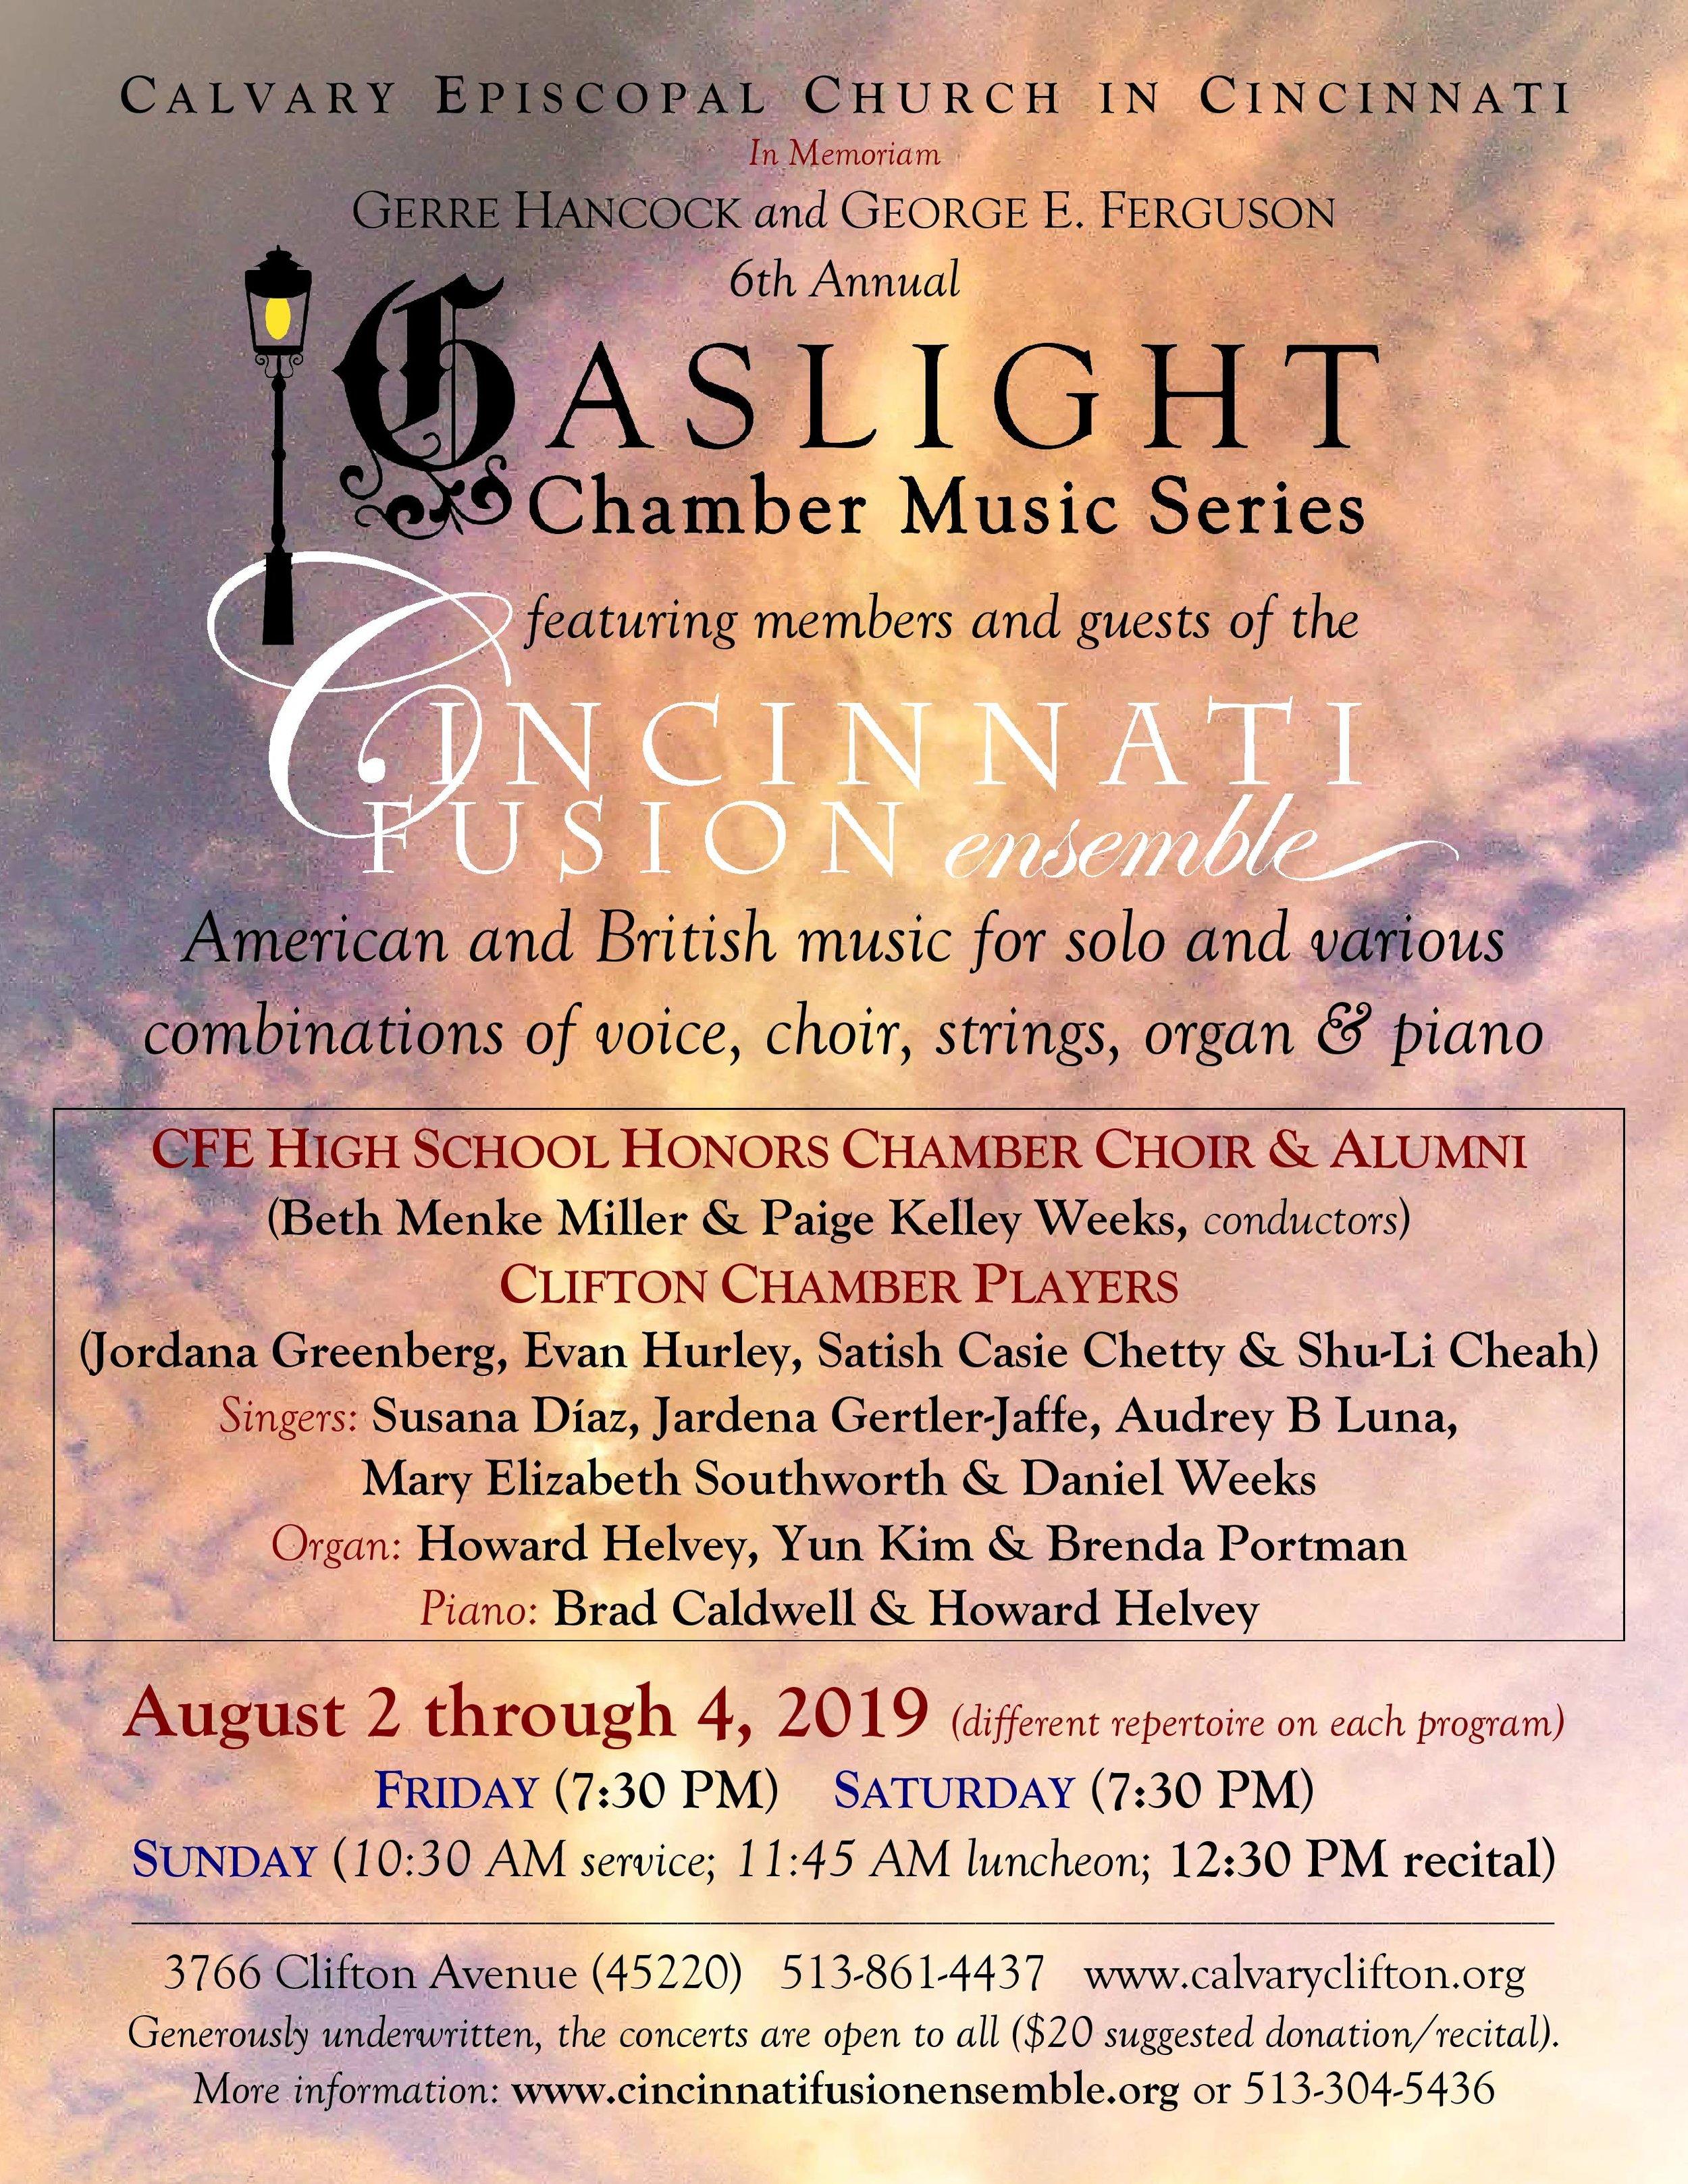 Gaslight Chamber Music Series 2019 POSTER 8.5x11.jpg